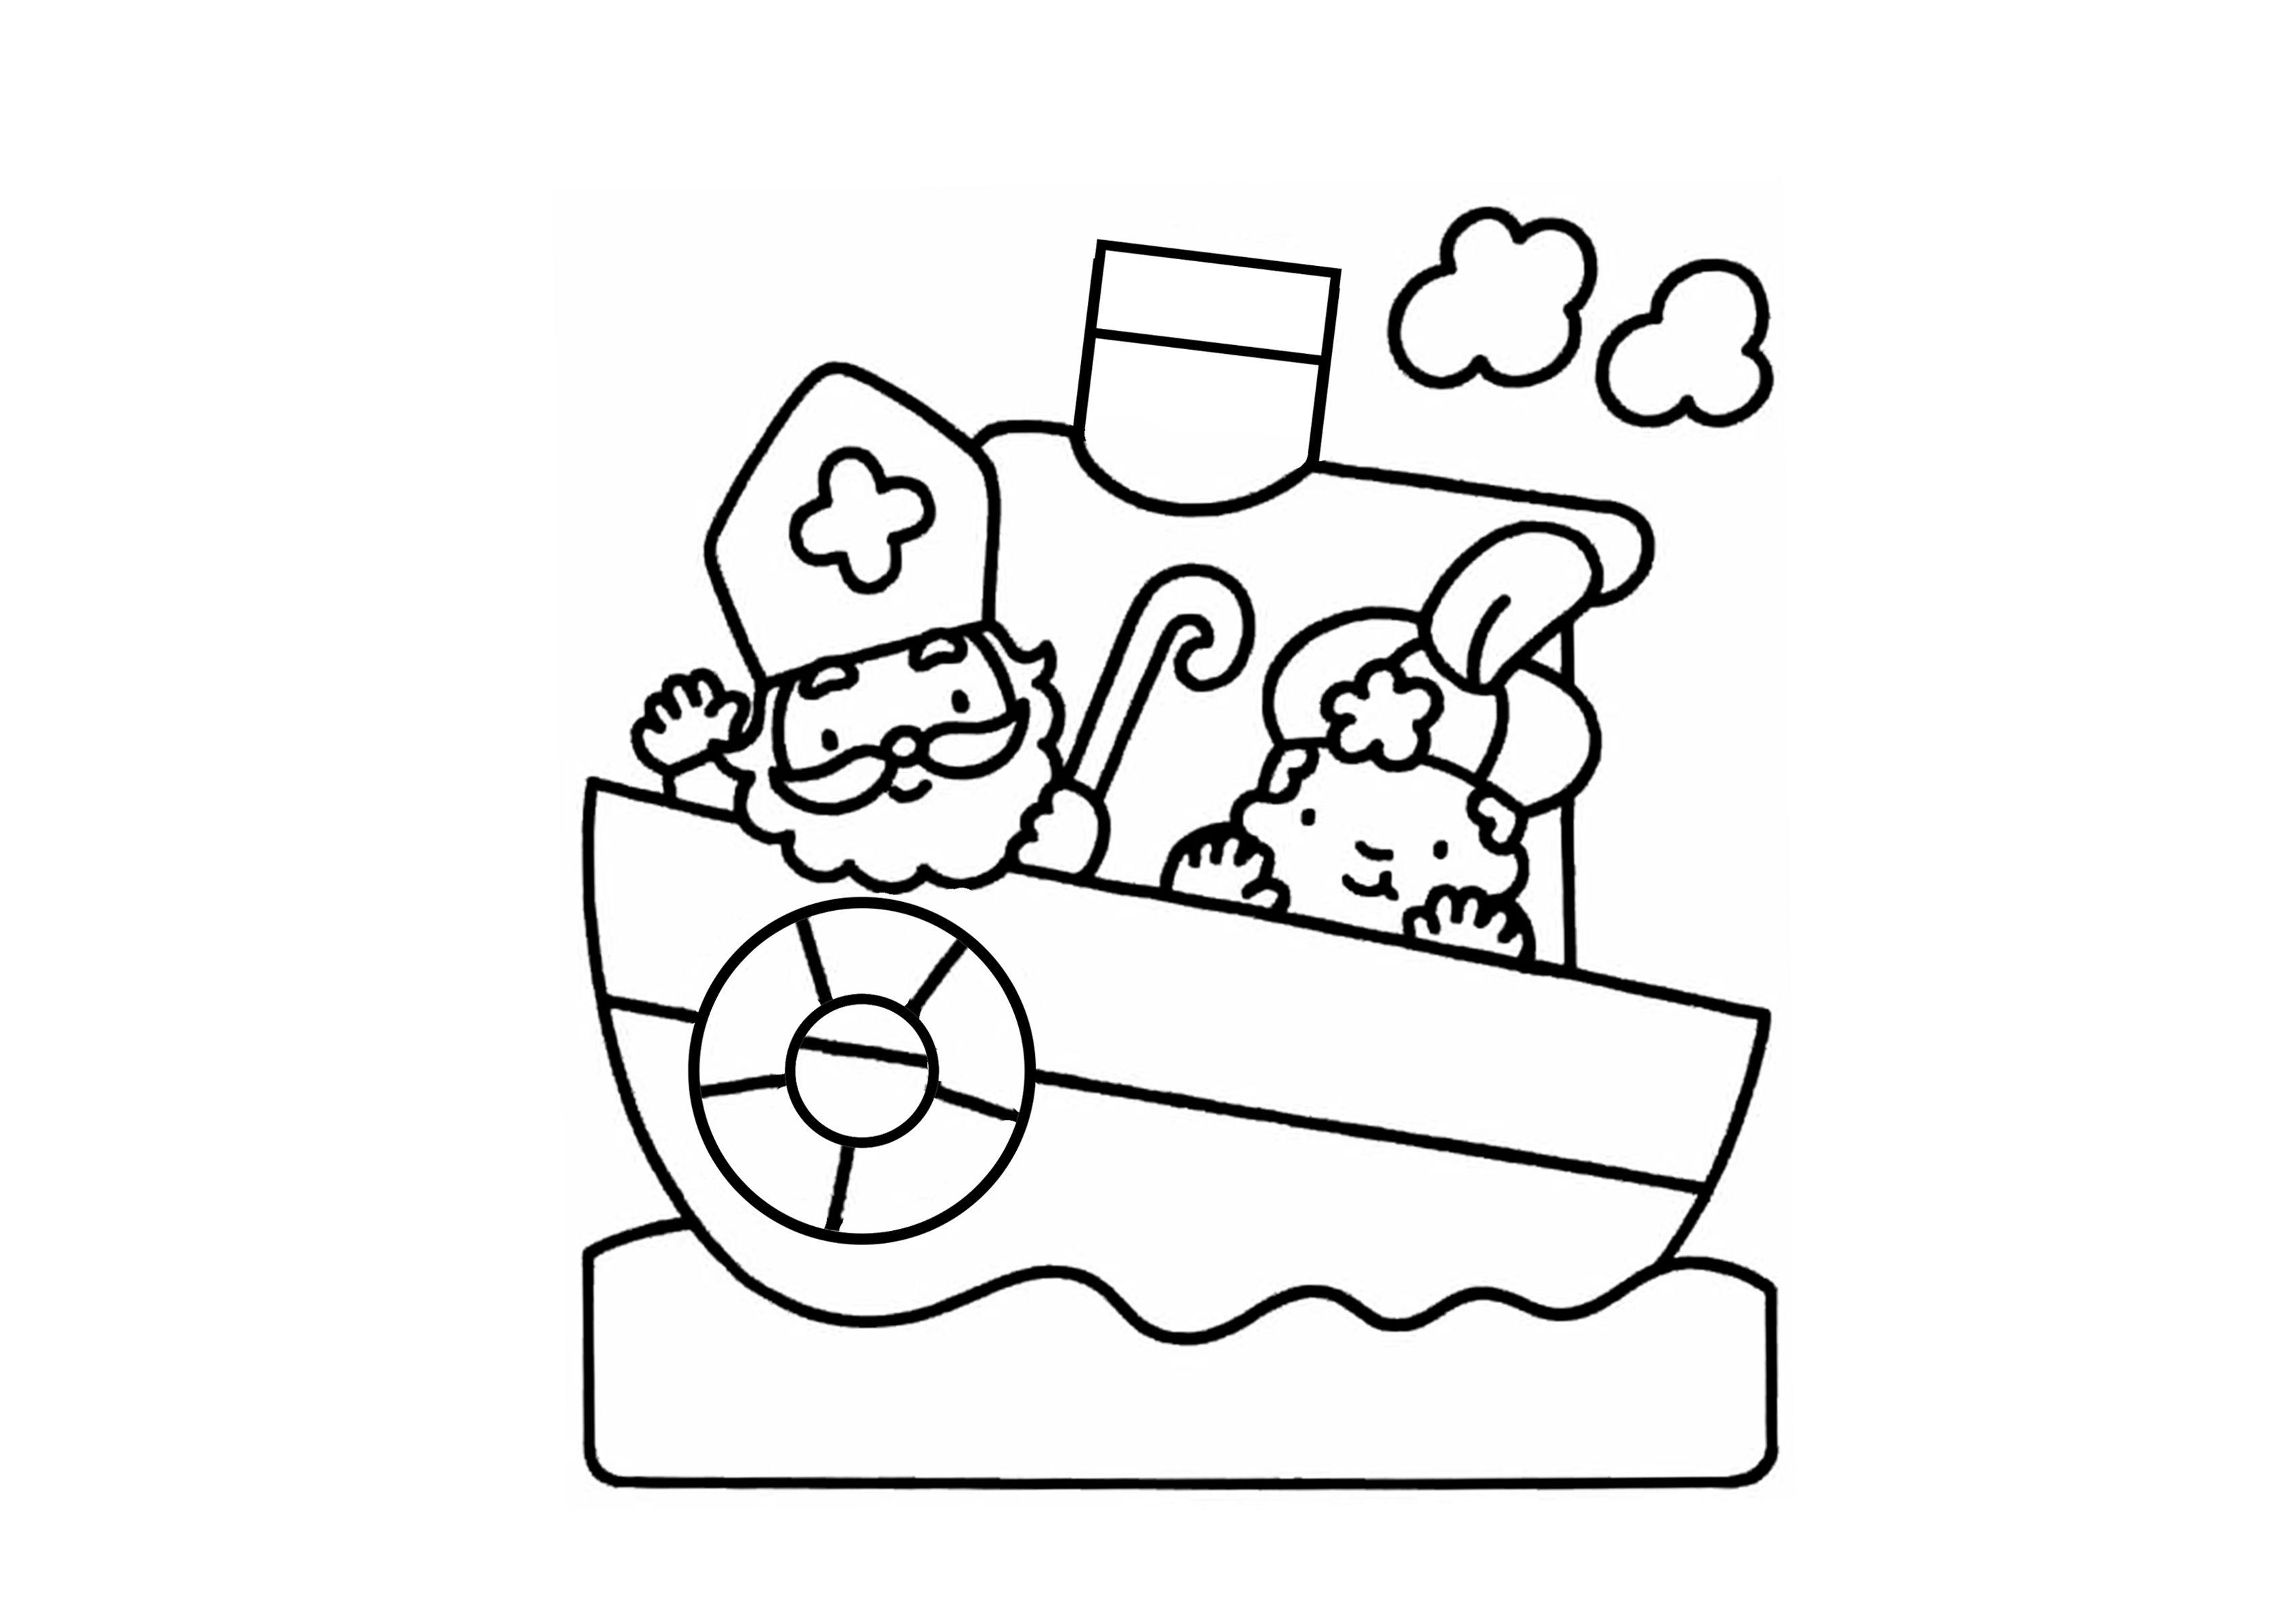 Sinterklaas Stoomboot Kleurplaat Sinterklaas Knutselen Sinterklaas Zwarte Piet